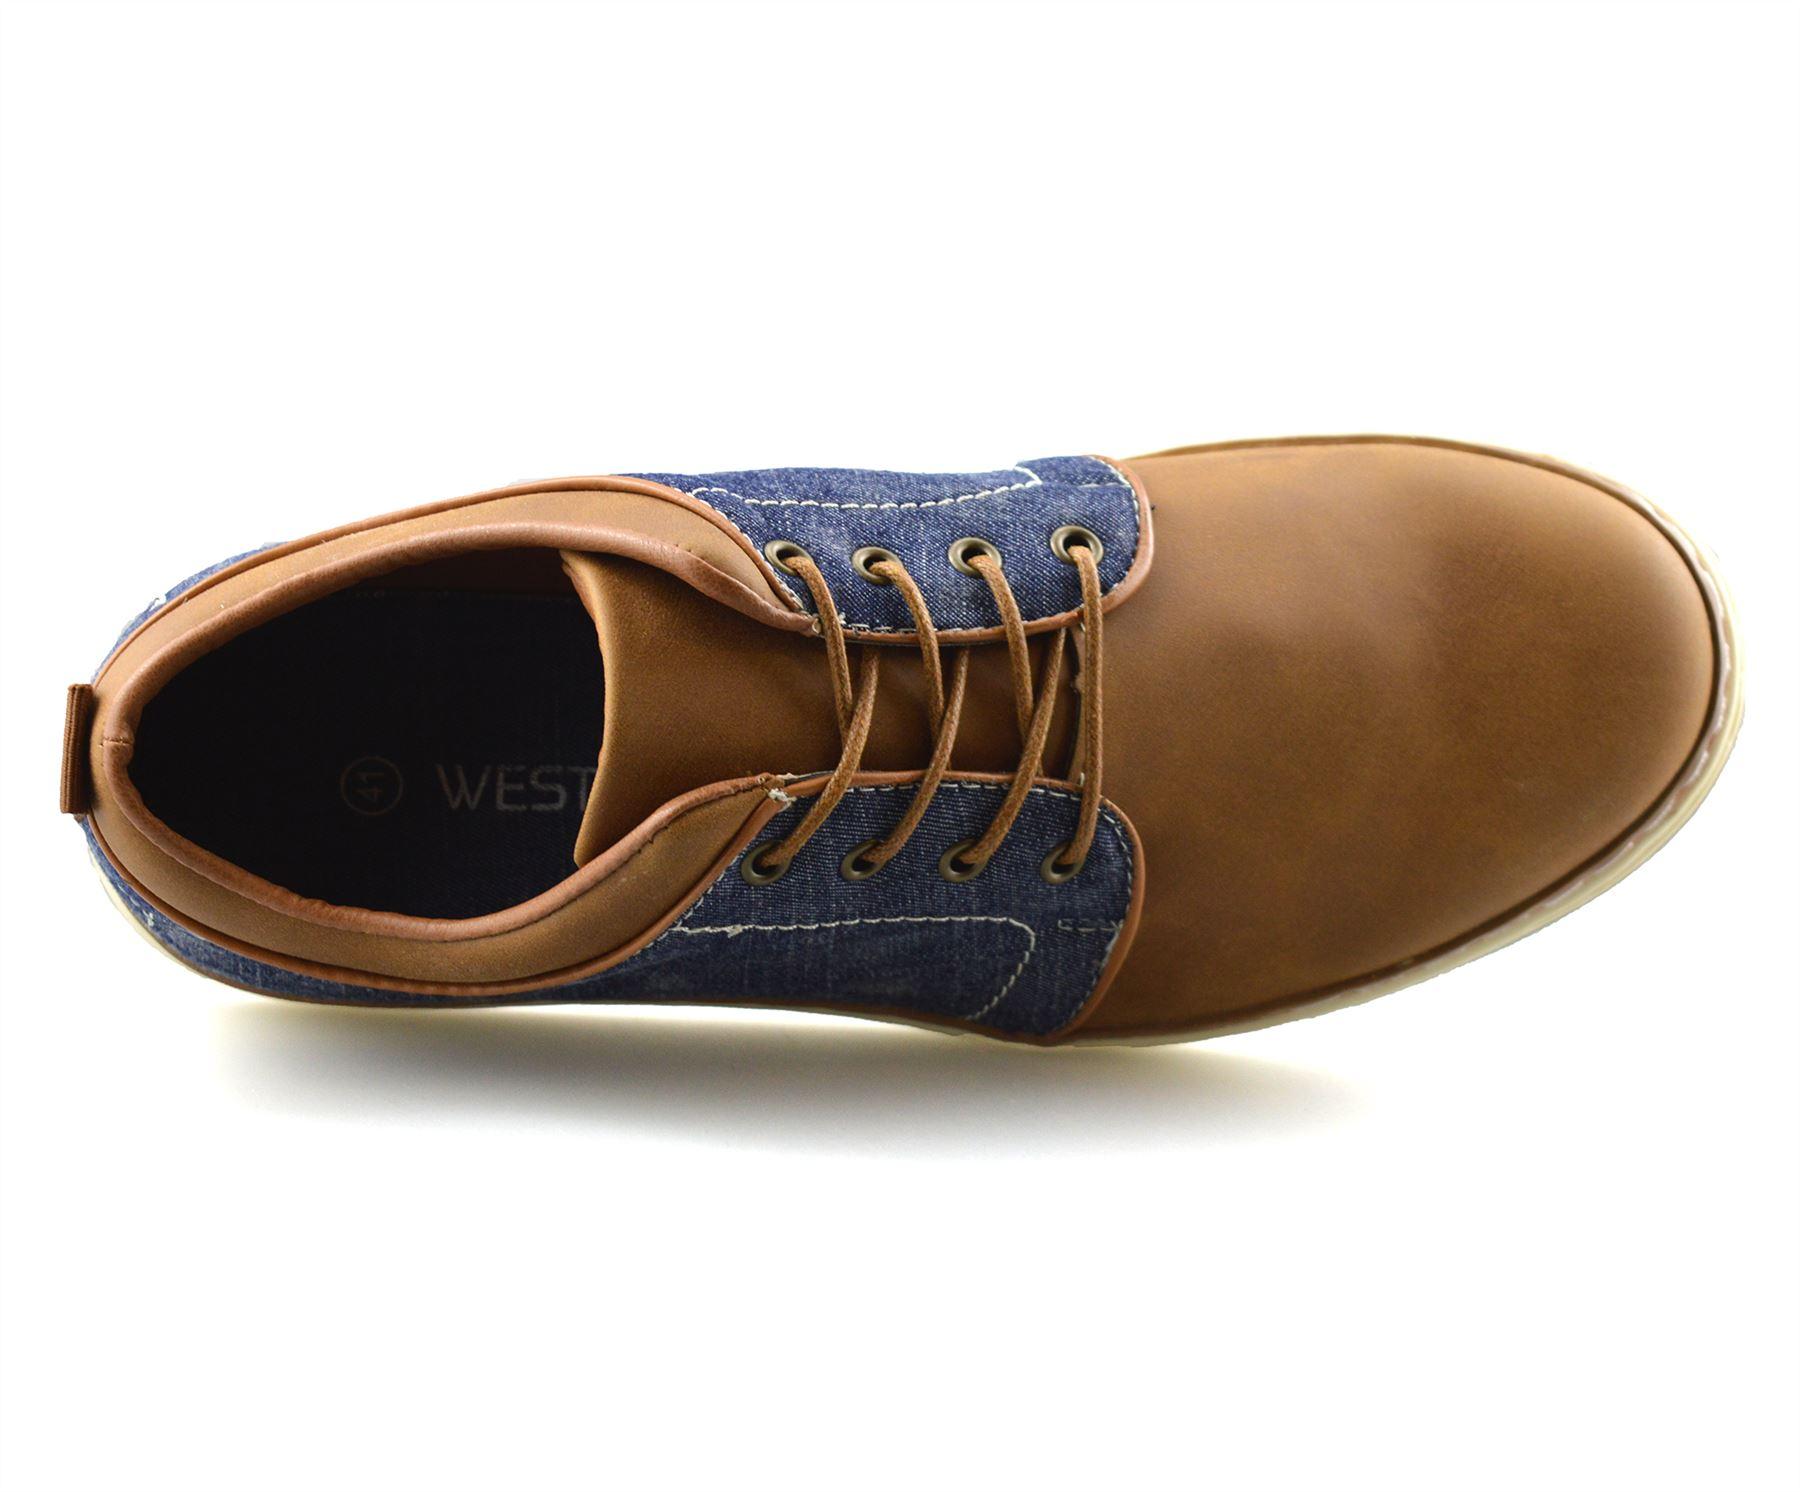 Homme-Nouveau-Casual-Smart-bateau-pont-Mocassin-Walking-Driving-Work-Lace-Up-Chaussures-Taille miniature 22